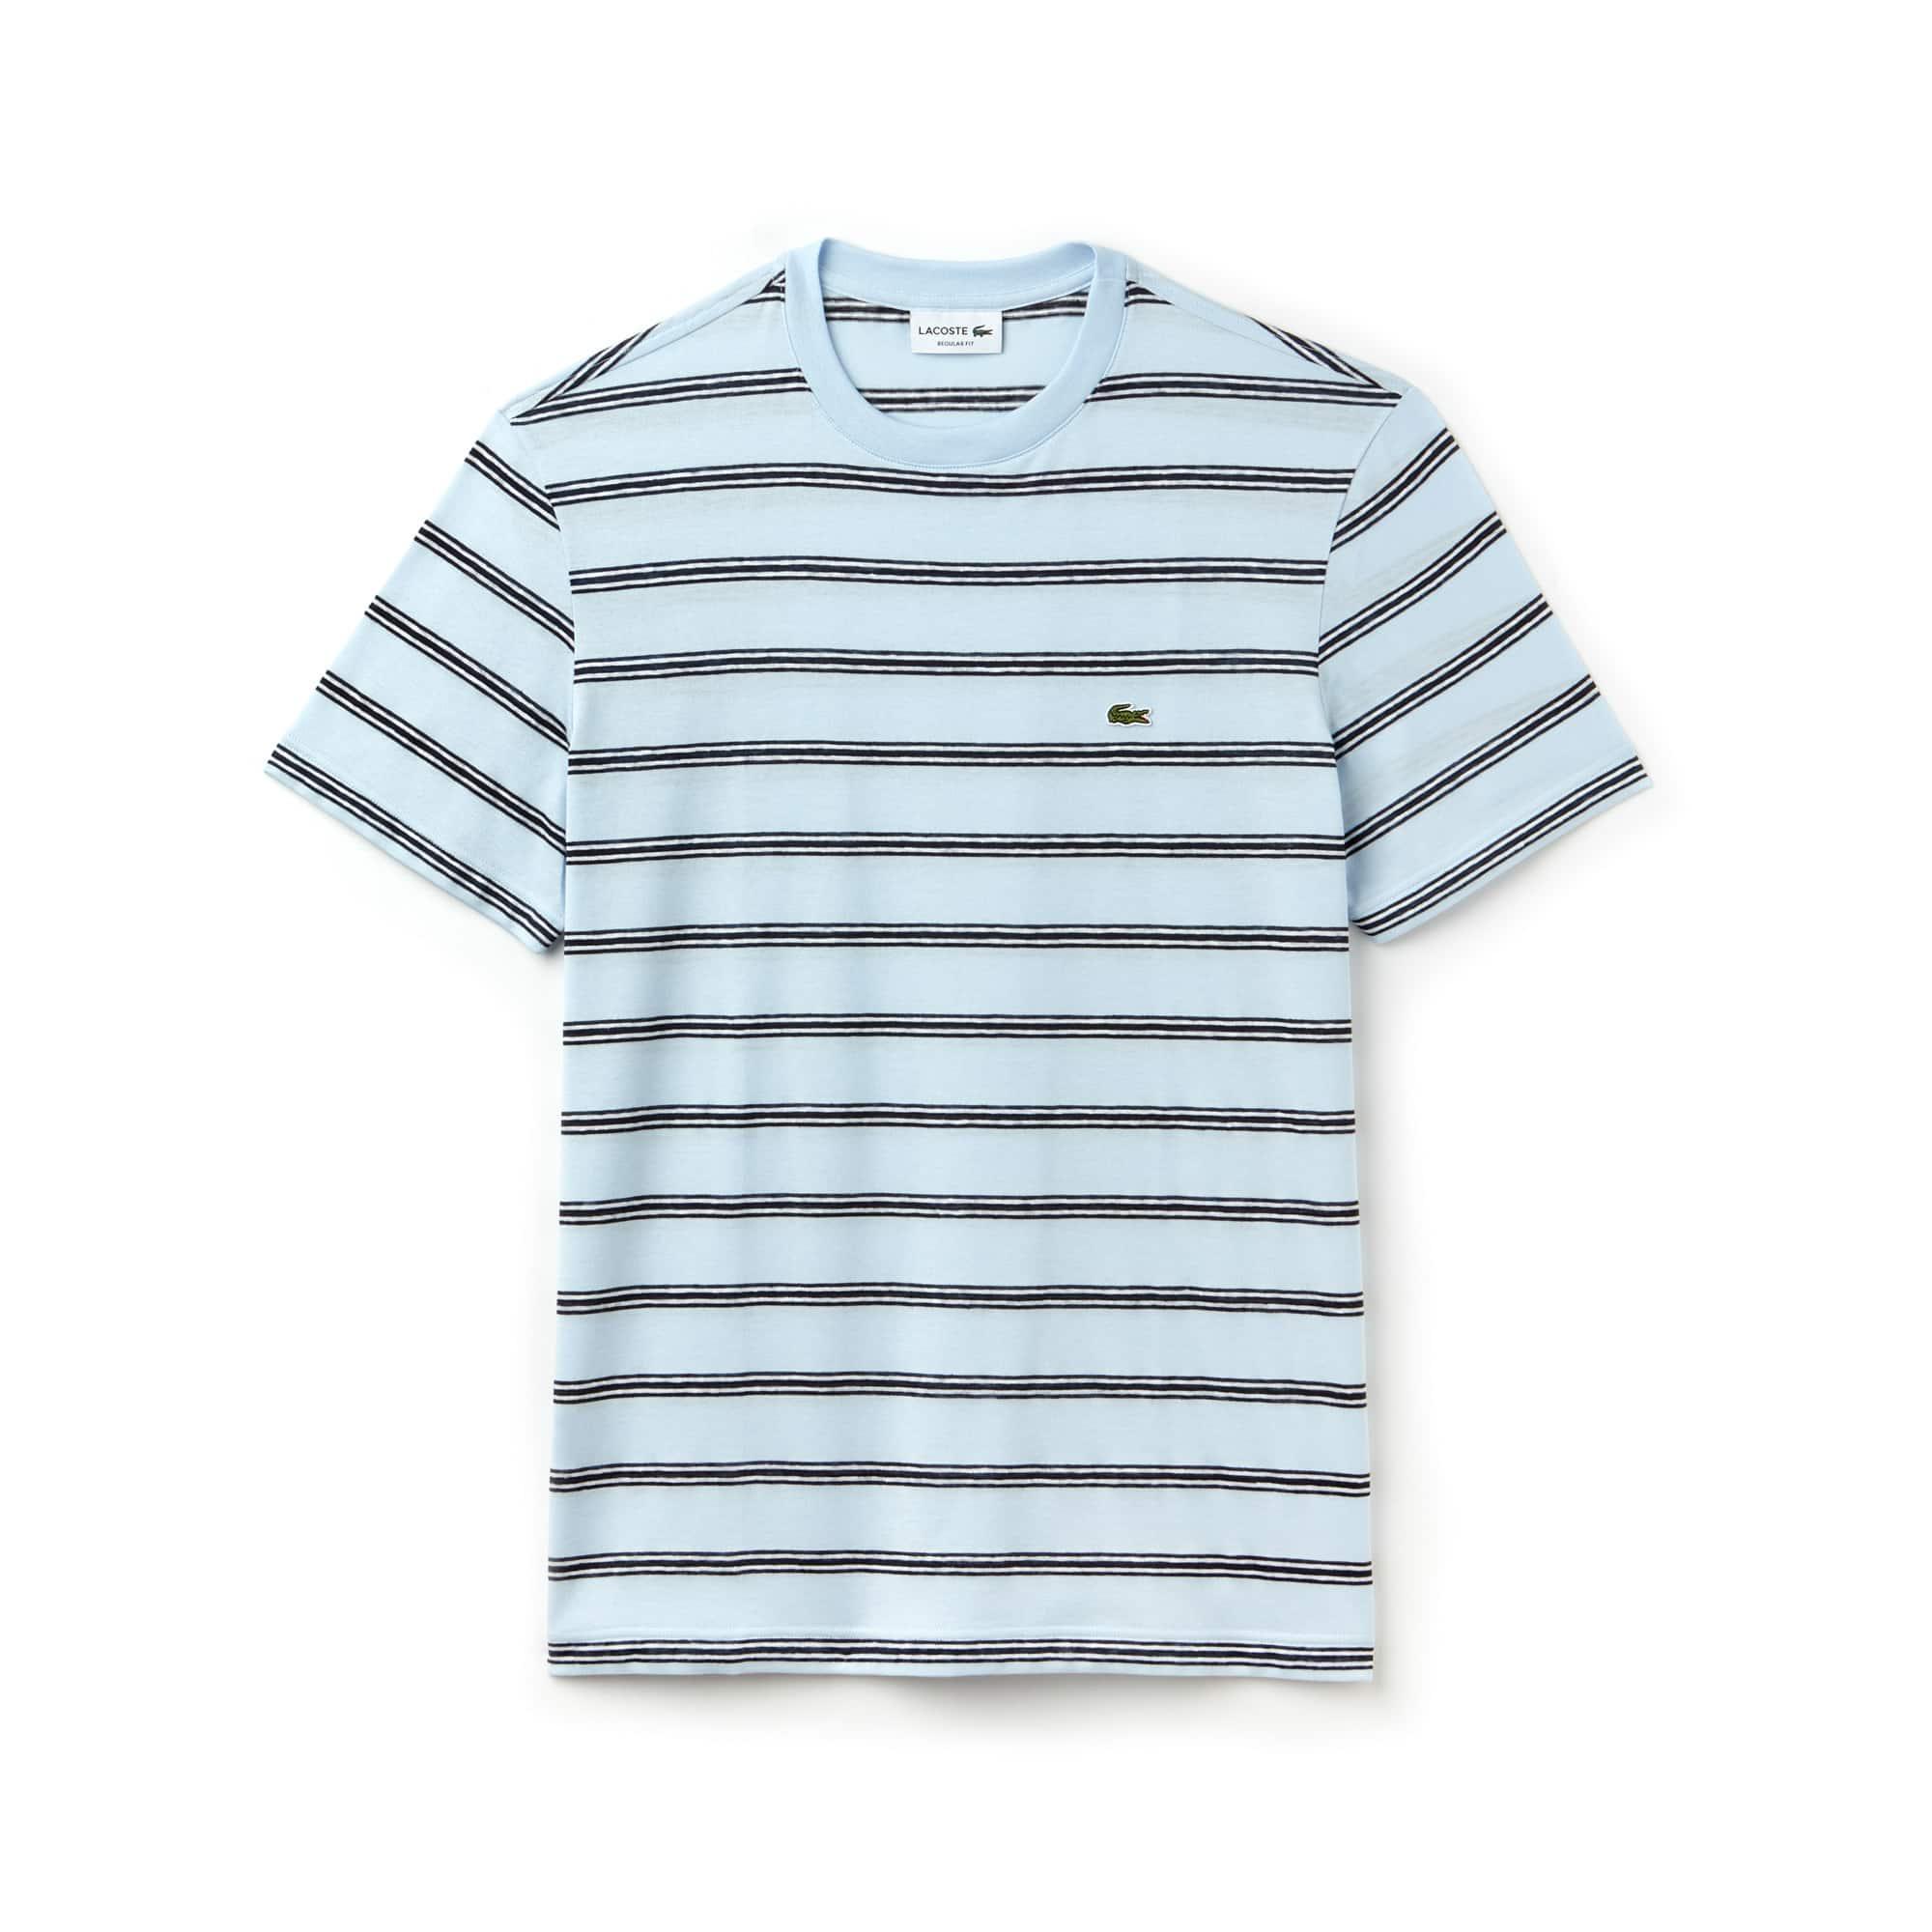 Men's Crew Neck Striped Cotton And Linen Jersey T-shirt